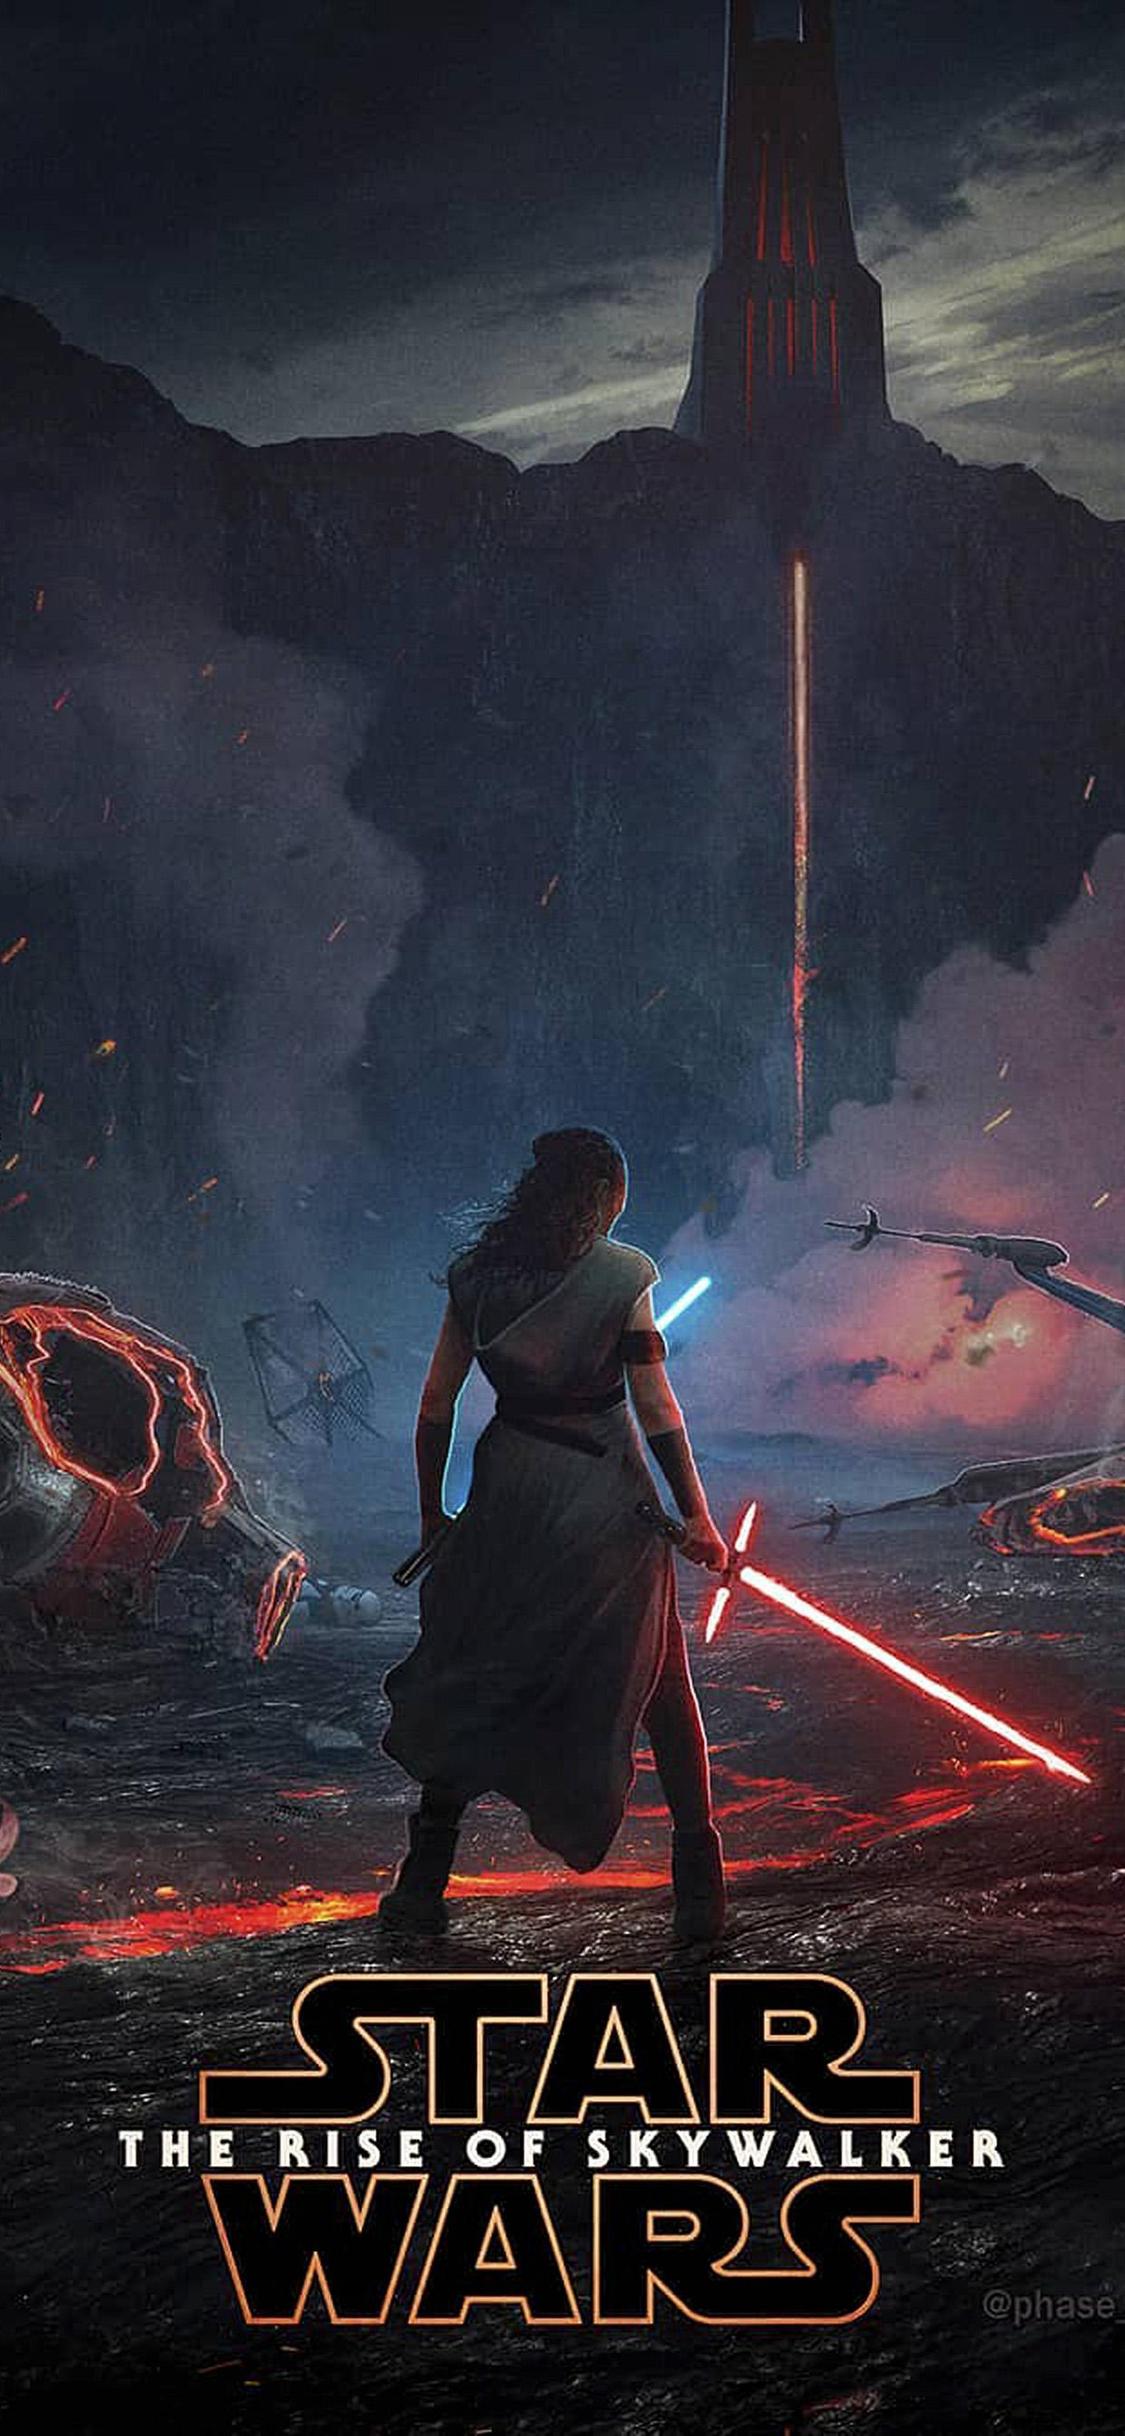 Star Wars Heroes Wallpapers - Wallpaper Cave